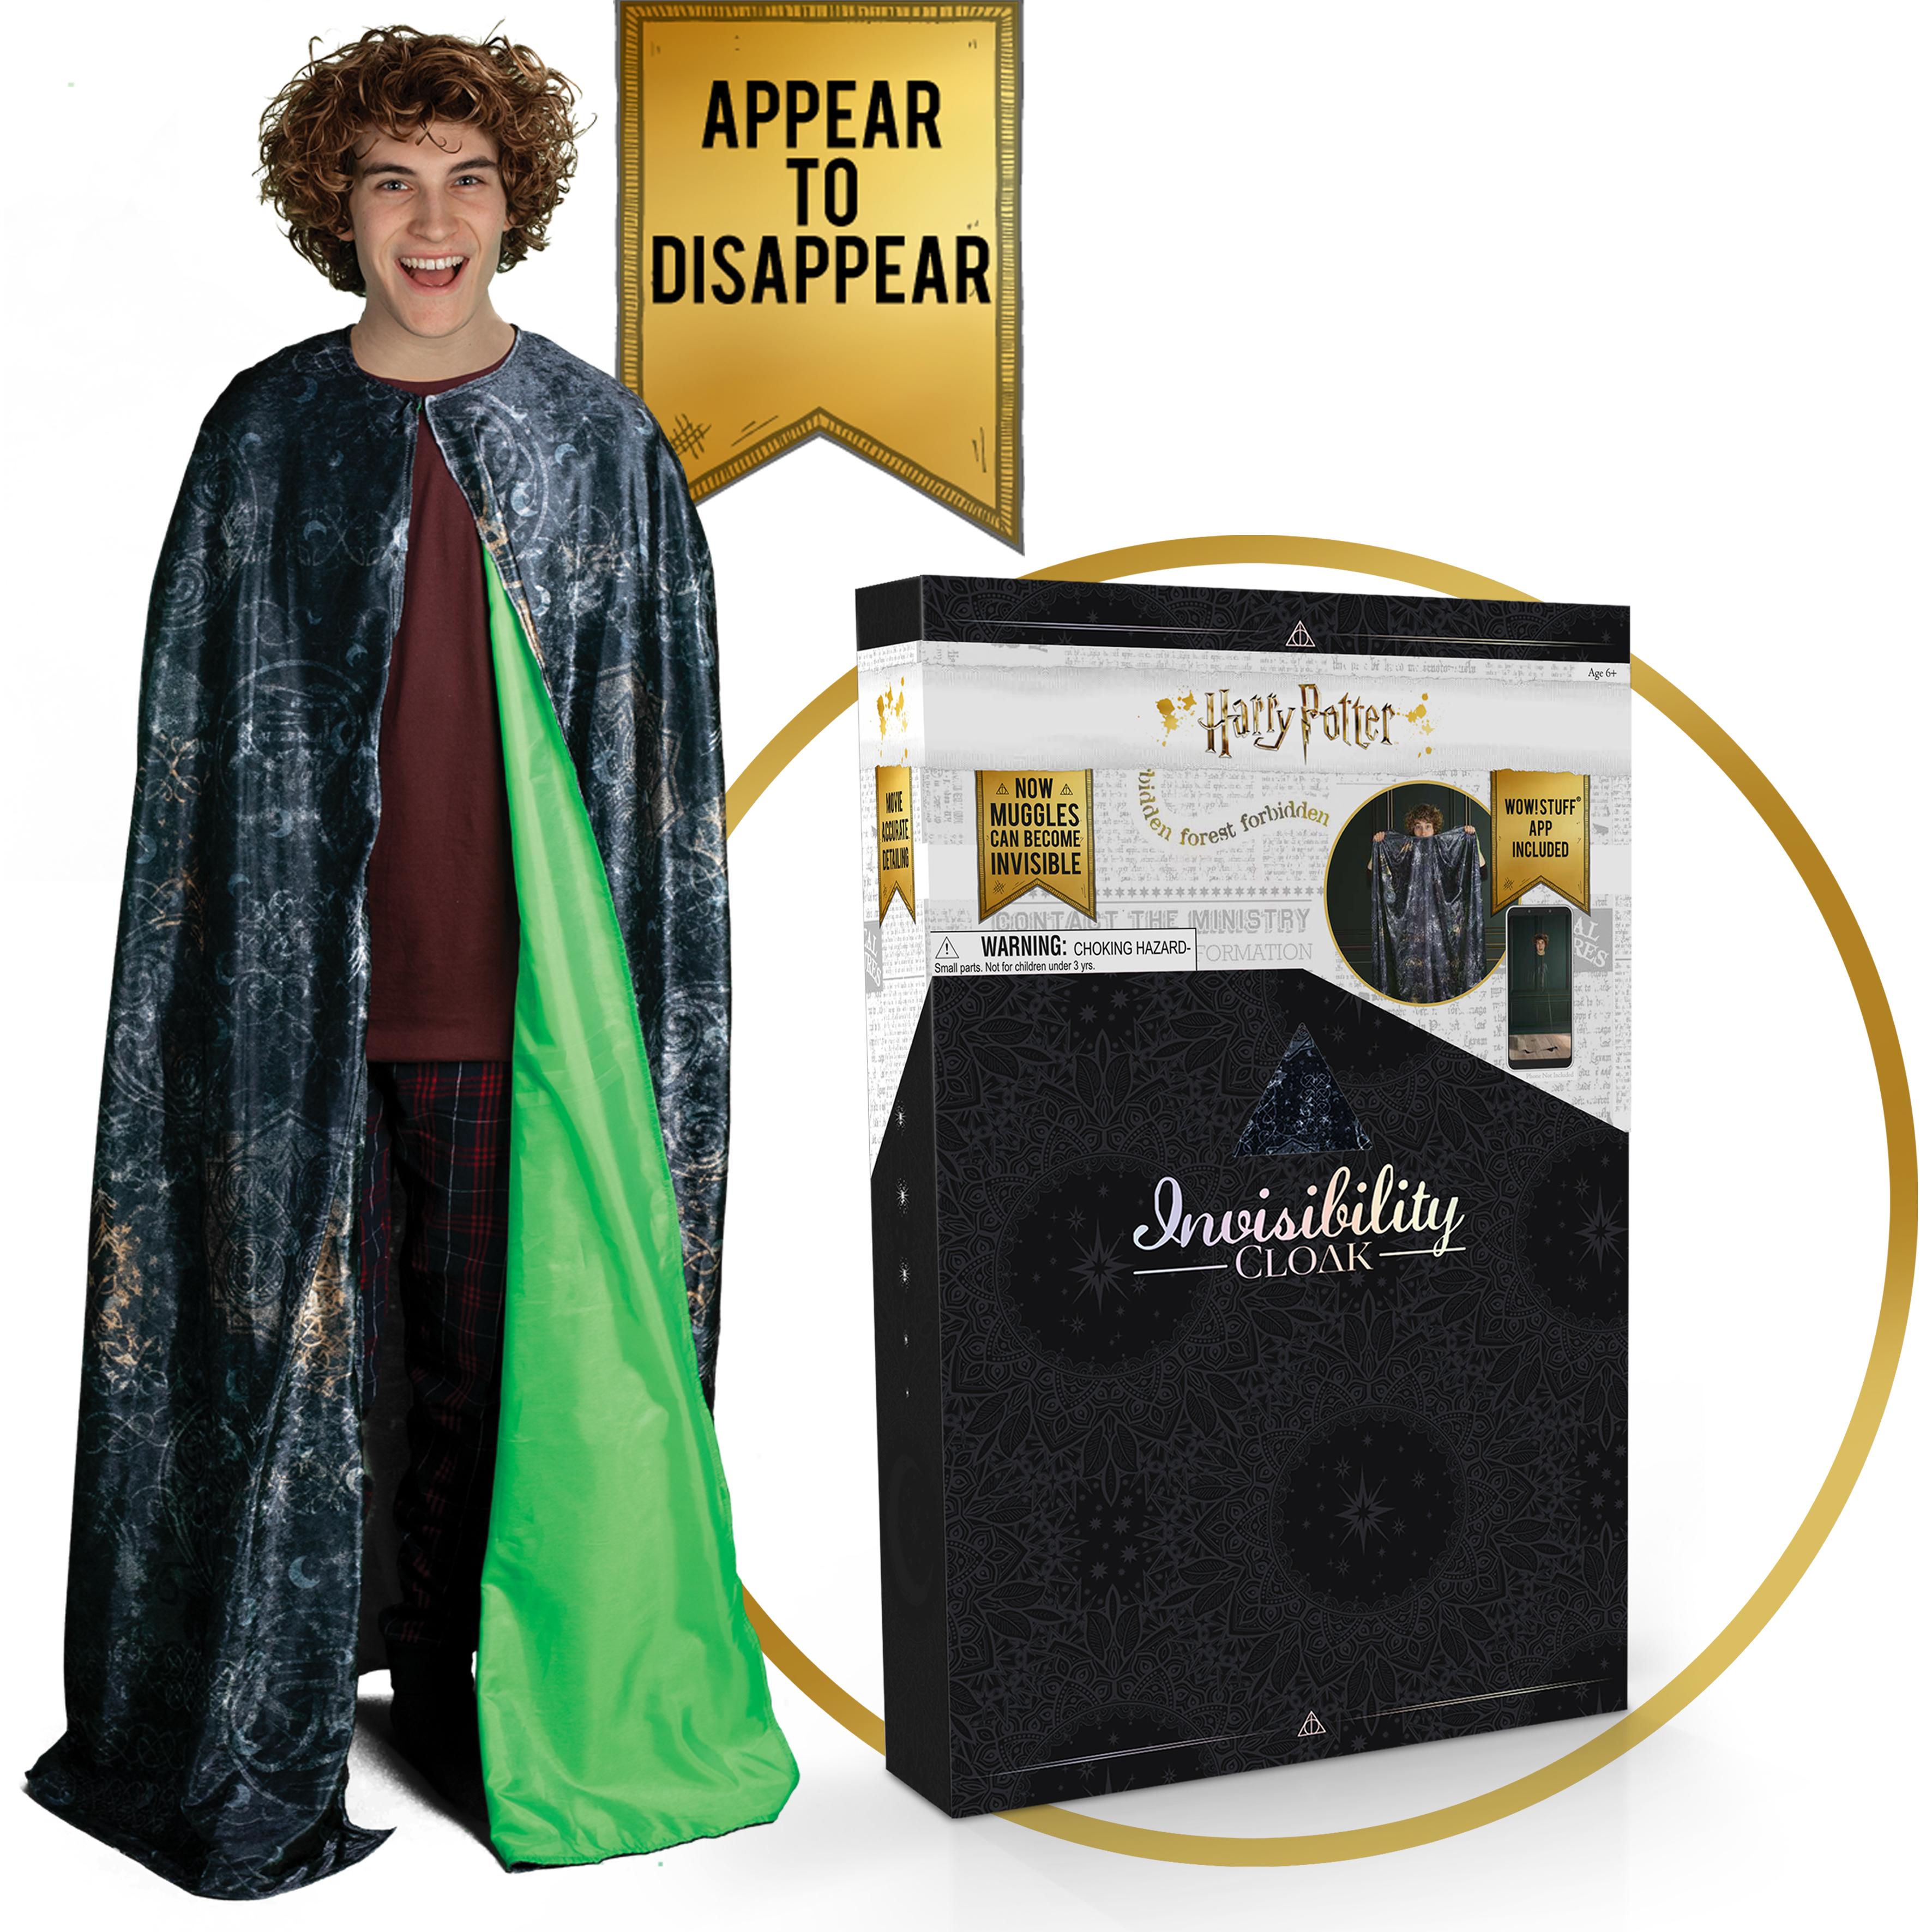 Harry Potter Invisibility Cloak- $15